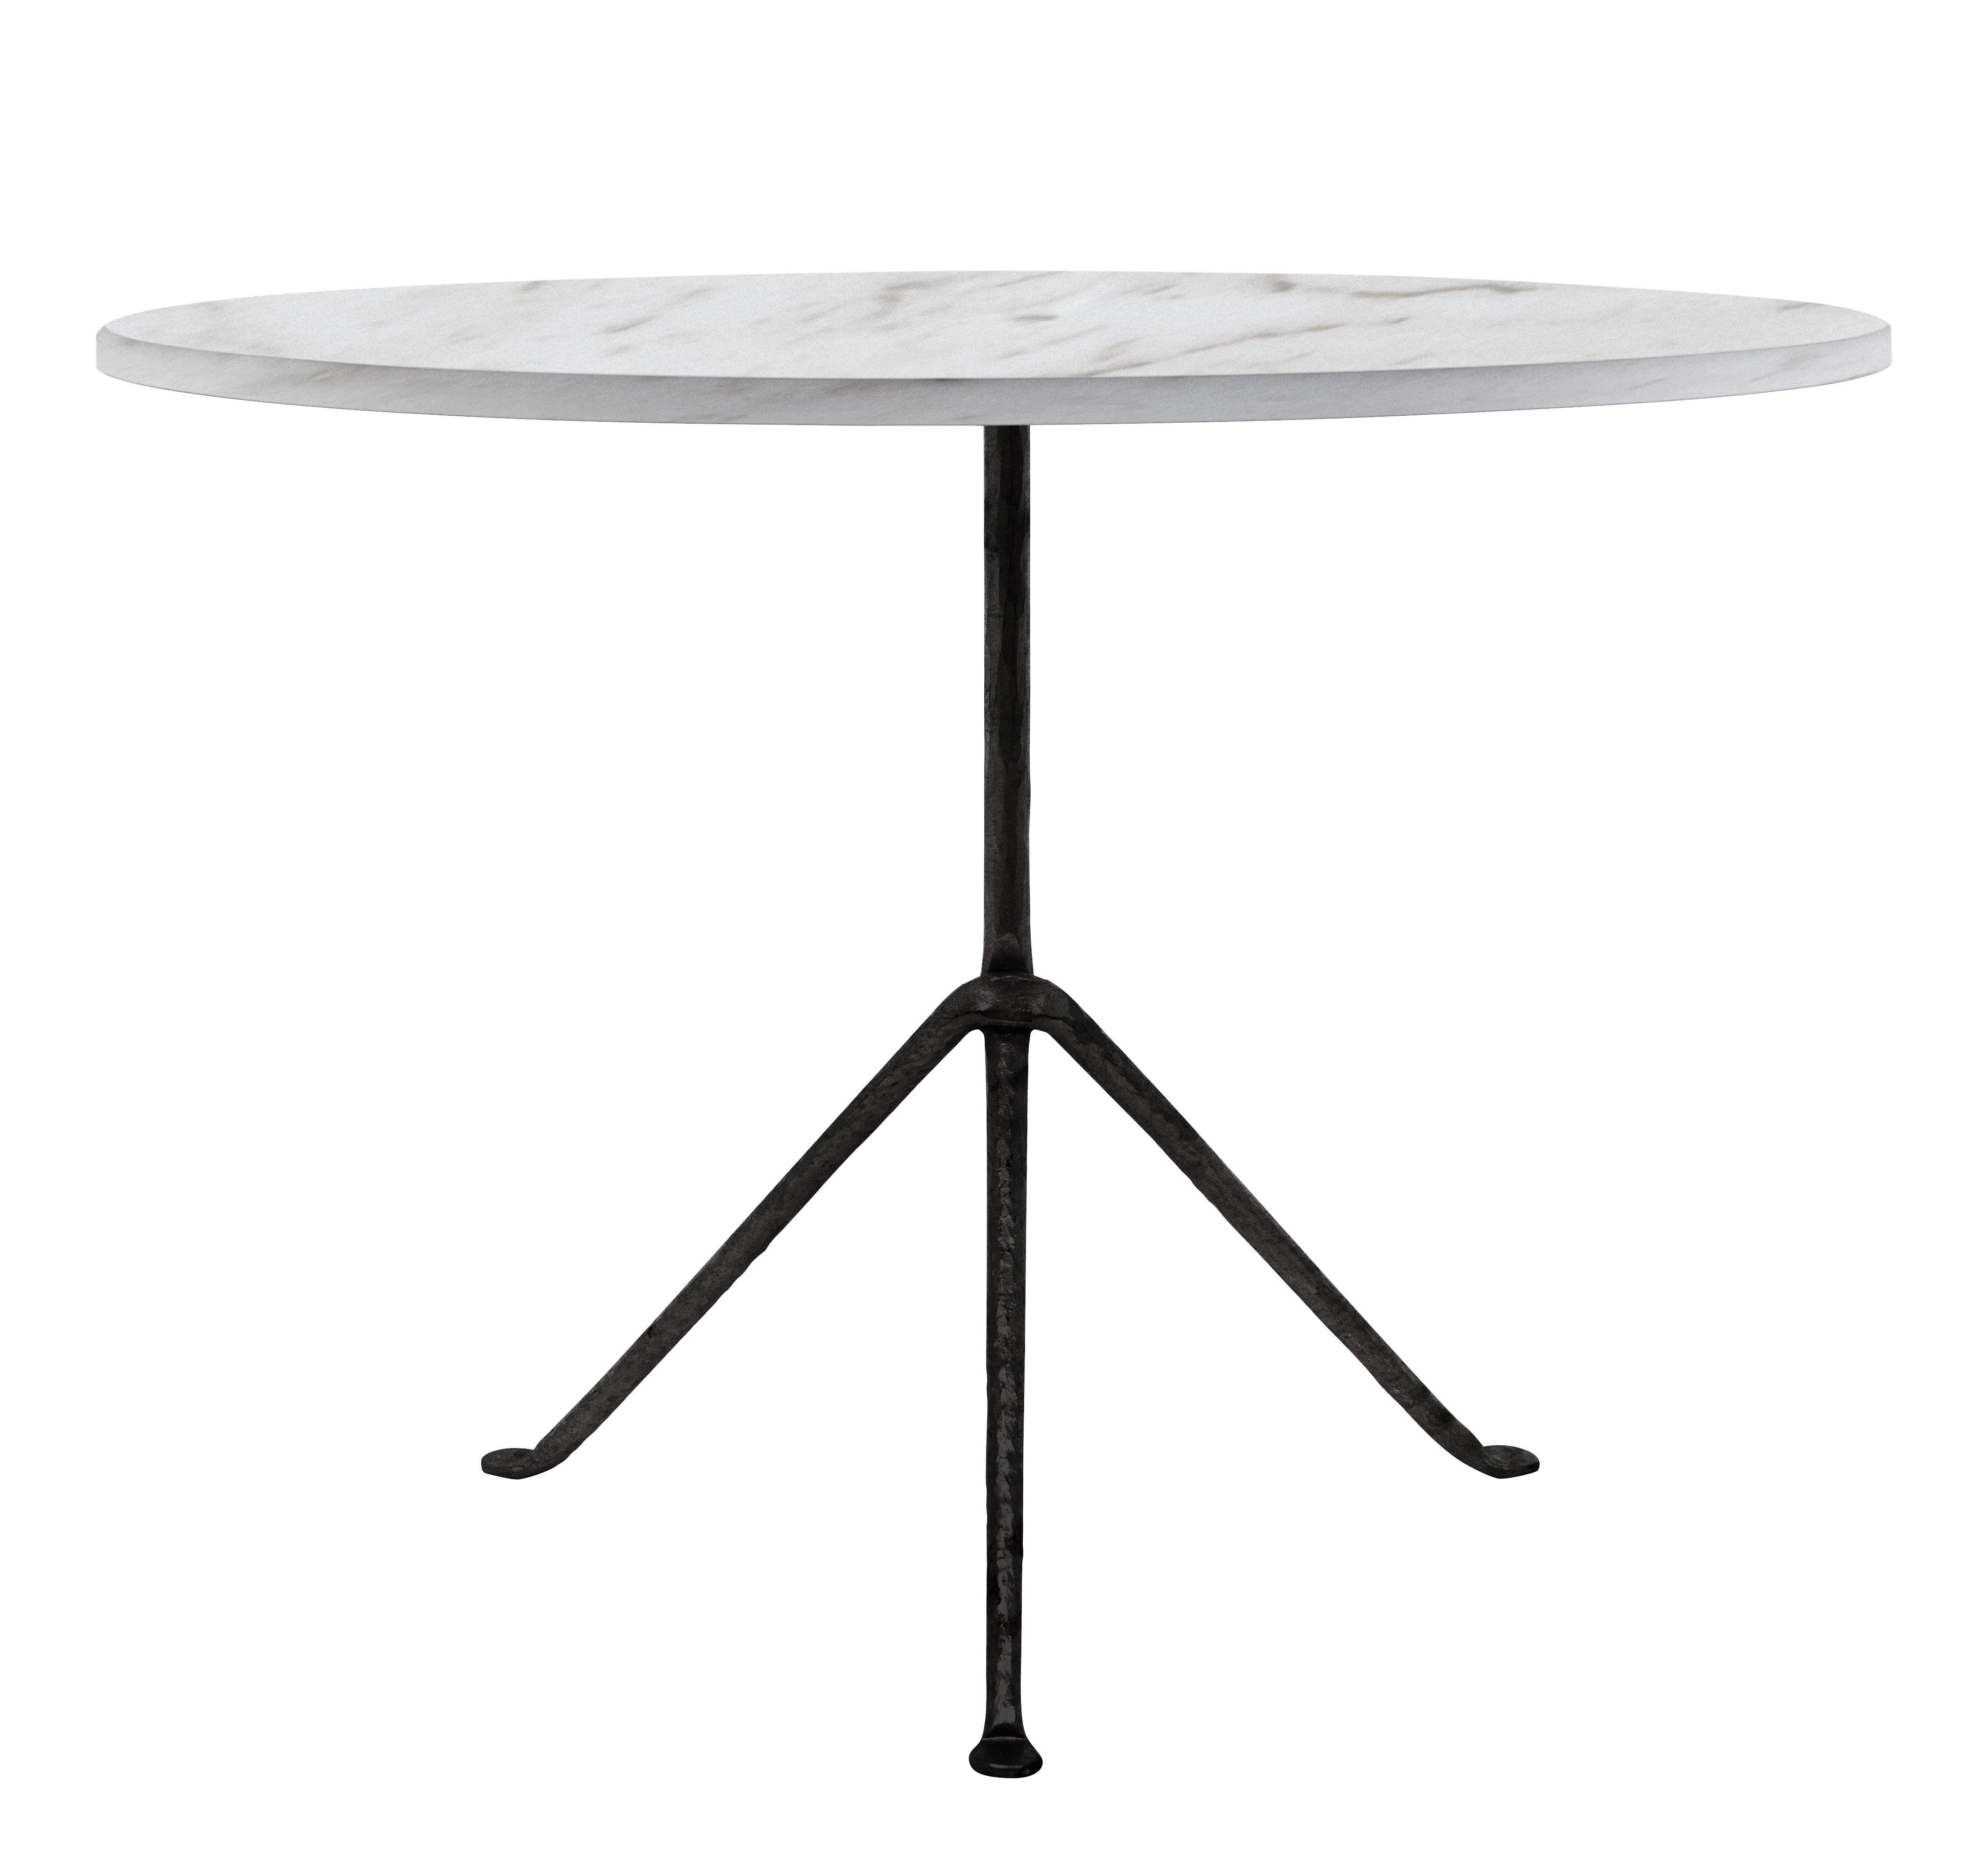 Table ronde Officina Outdoor / Ø 100 cm - Plateau Marbre - Magis